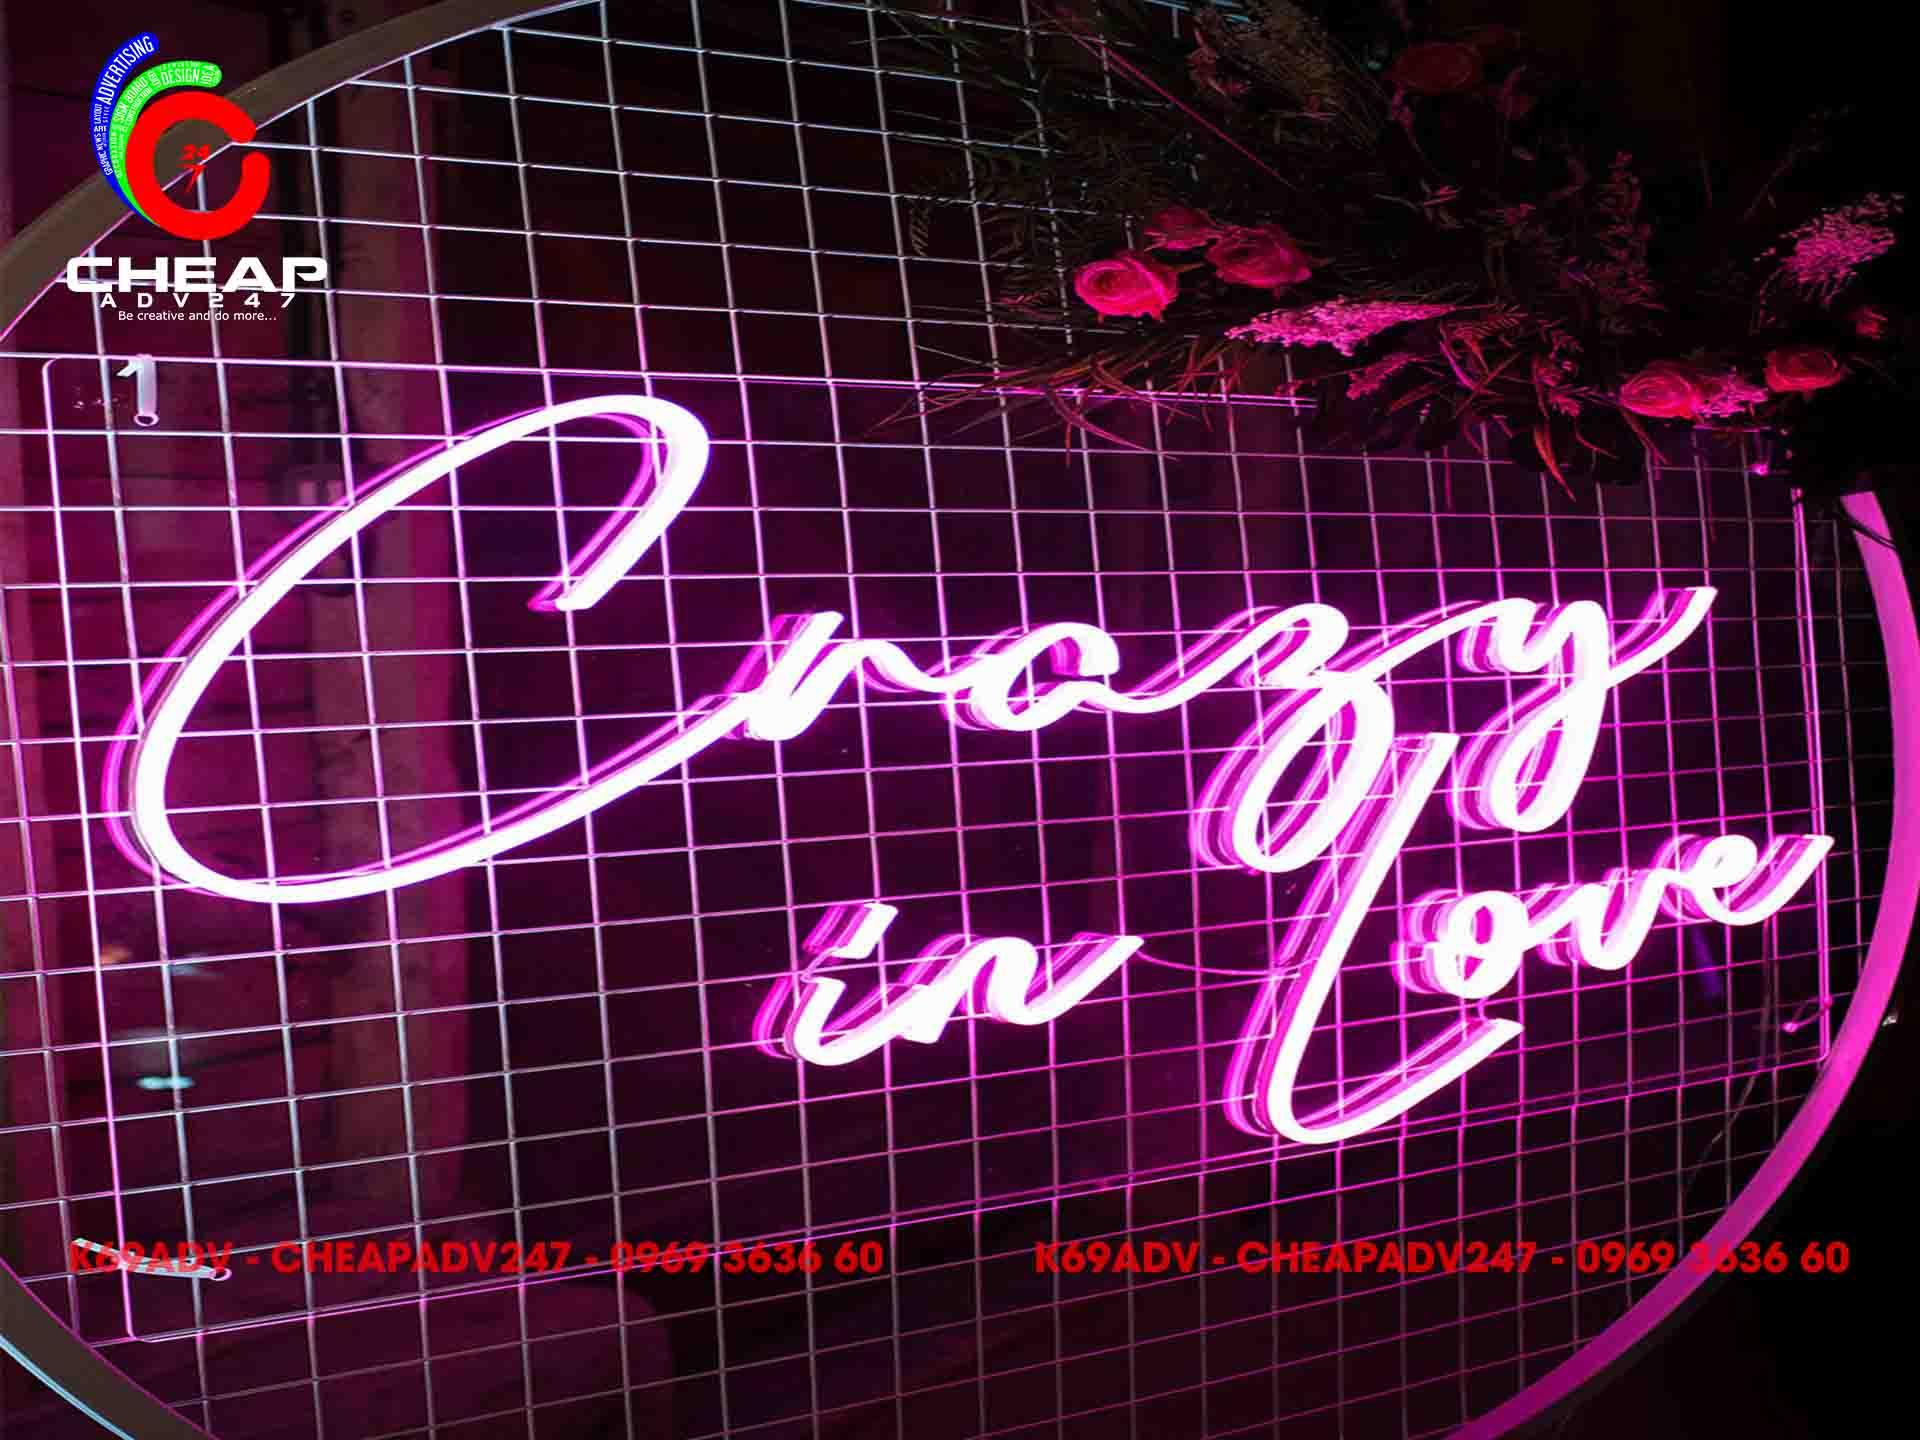 lam den neon sign cheapadv247 07